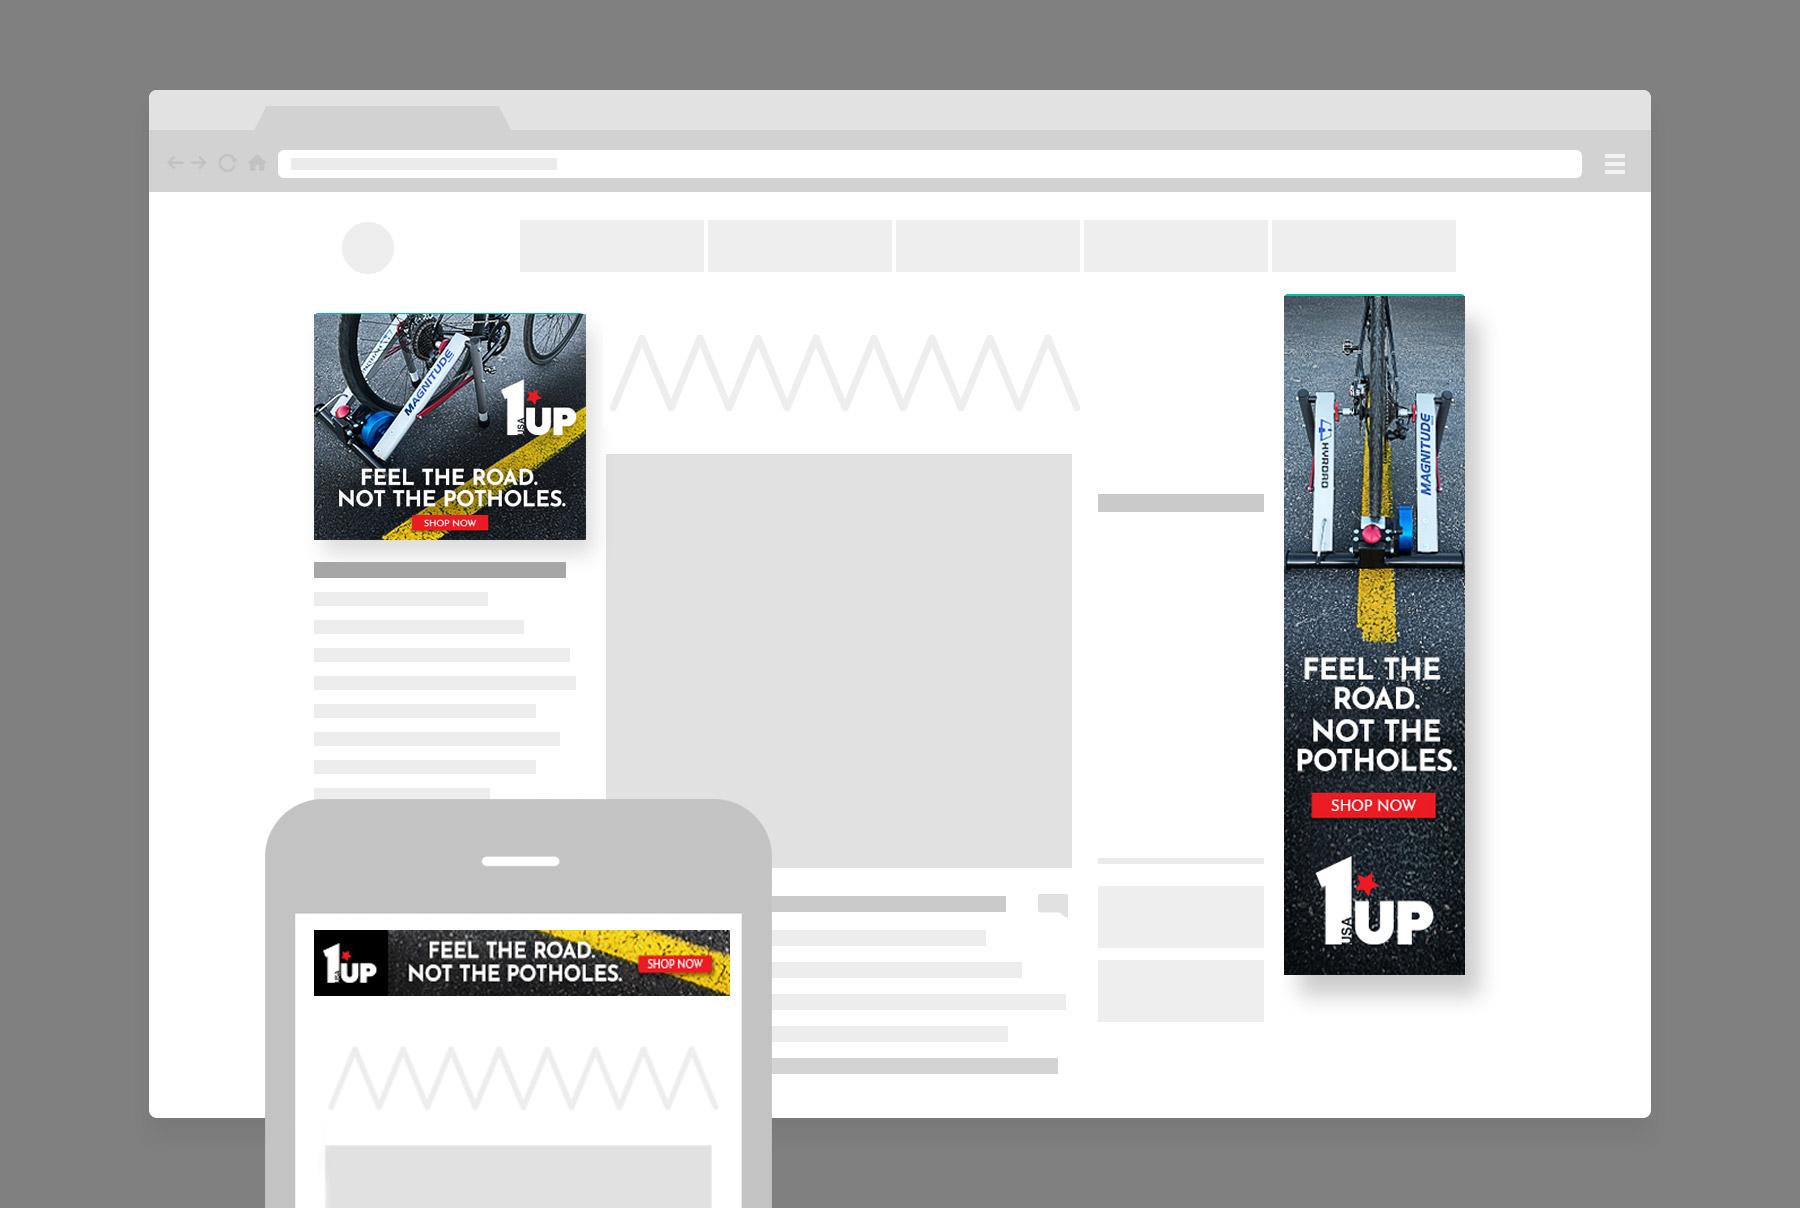 1UP USA Digital Banner Ads